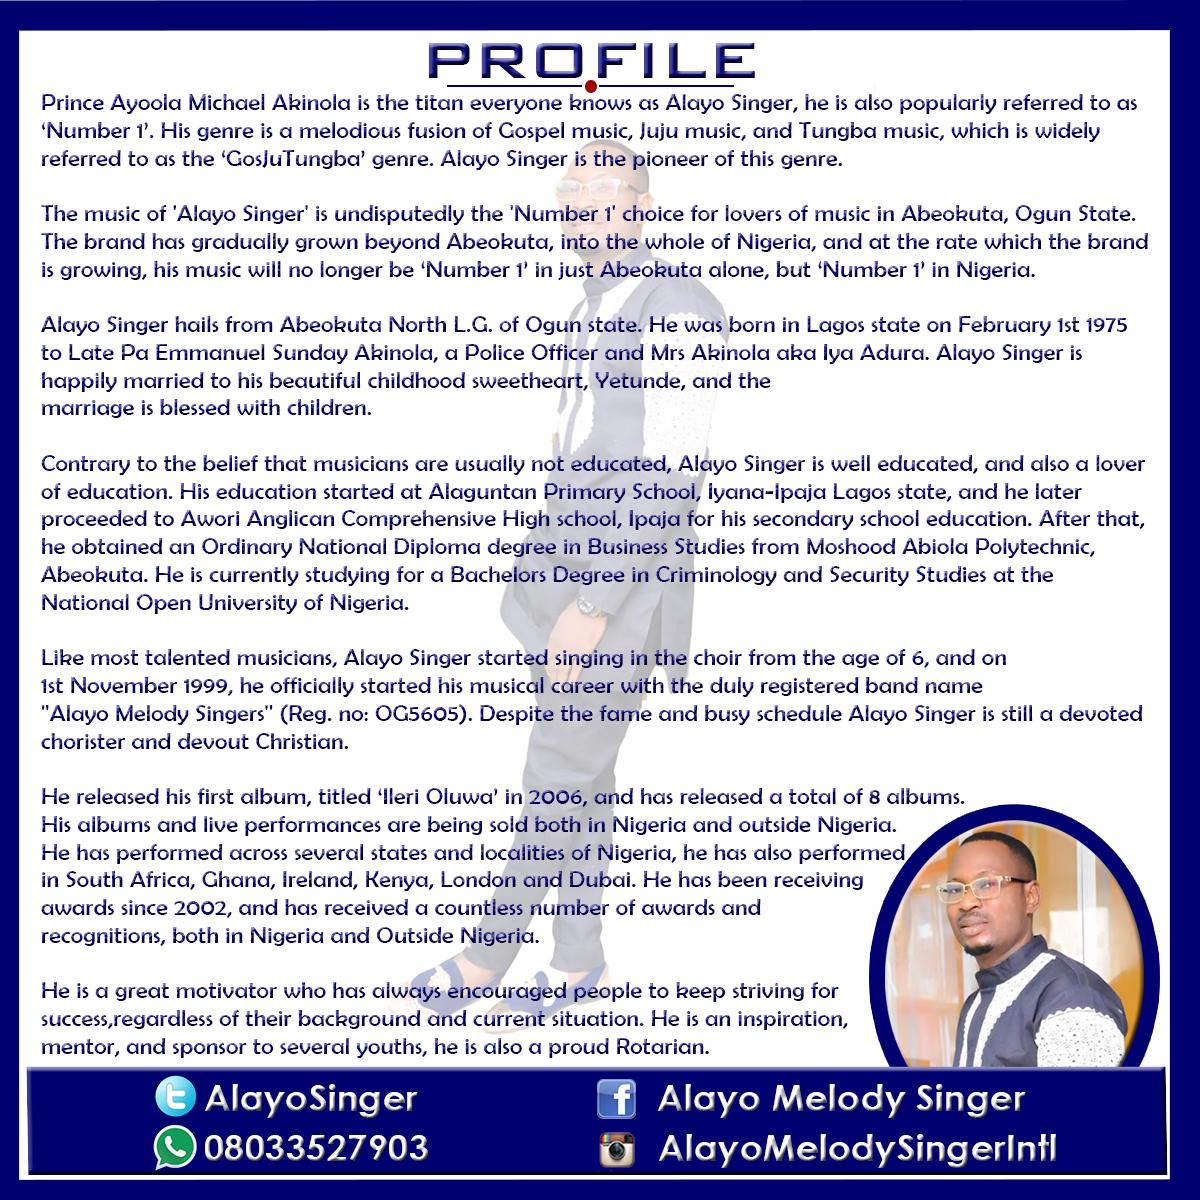 Official Blog For Prince Ayoola Akinola and his Alayo Melody Singers